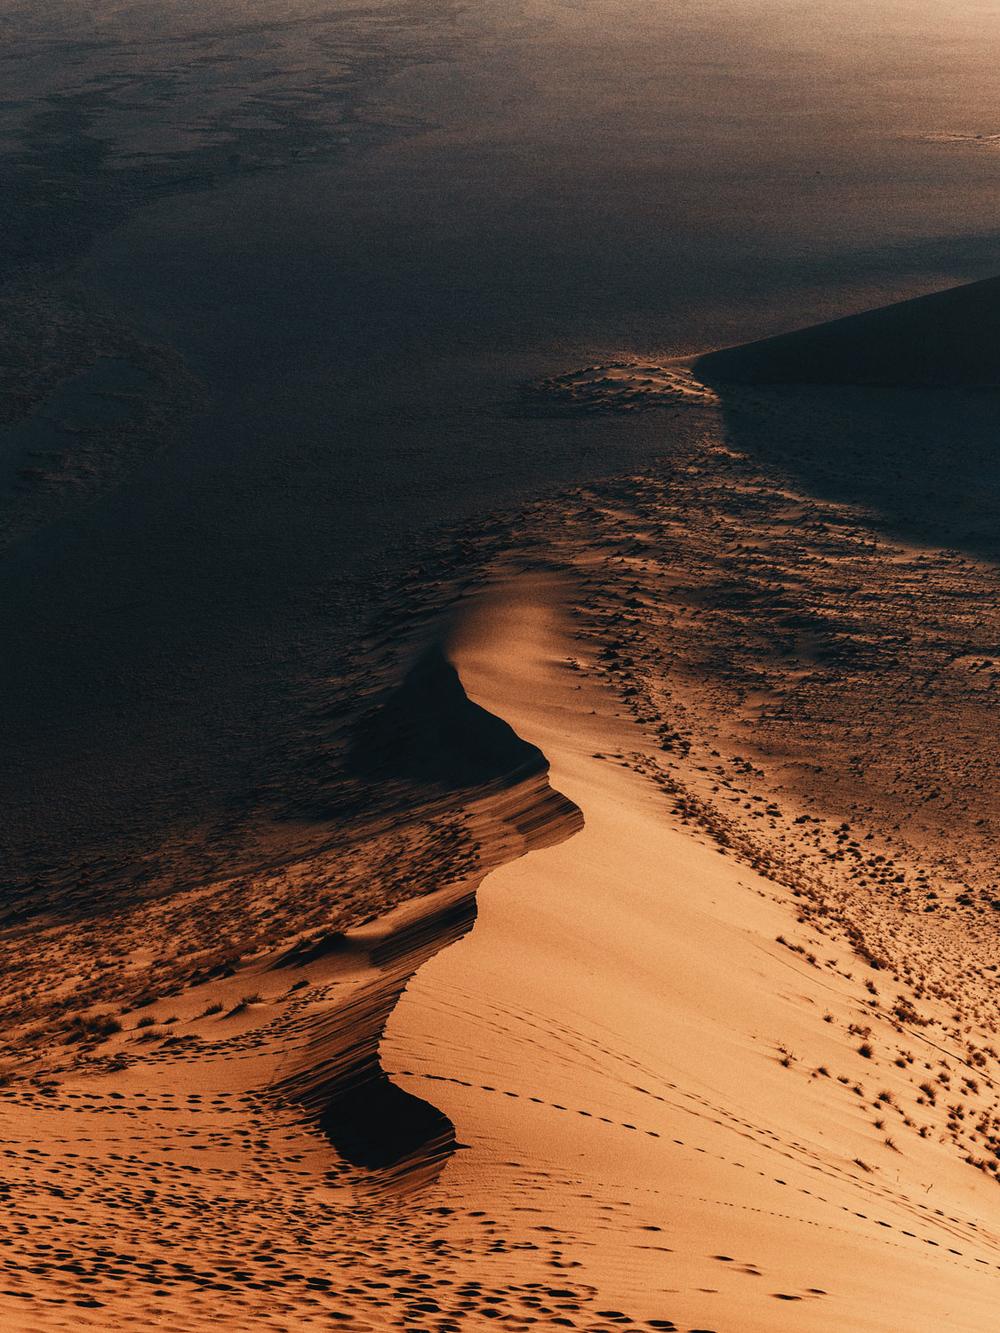 CallieGiovanna_Africa_Namibia_Dune45_20150101_00502.jpg